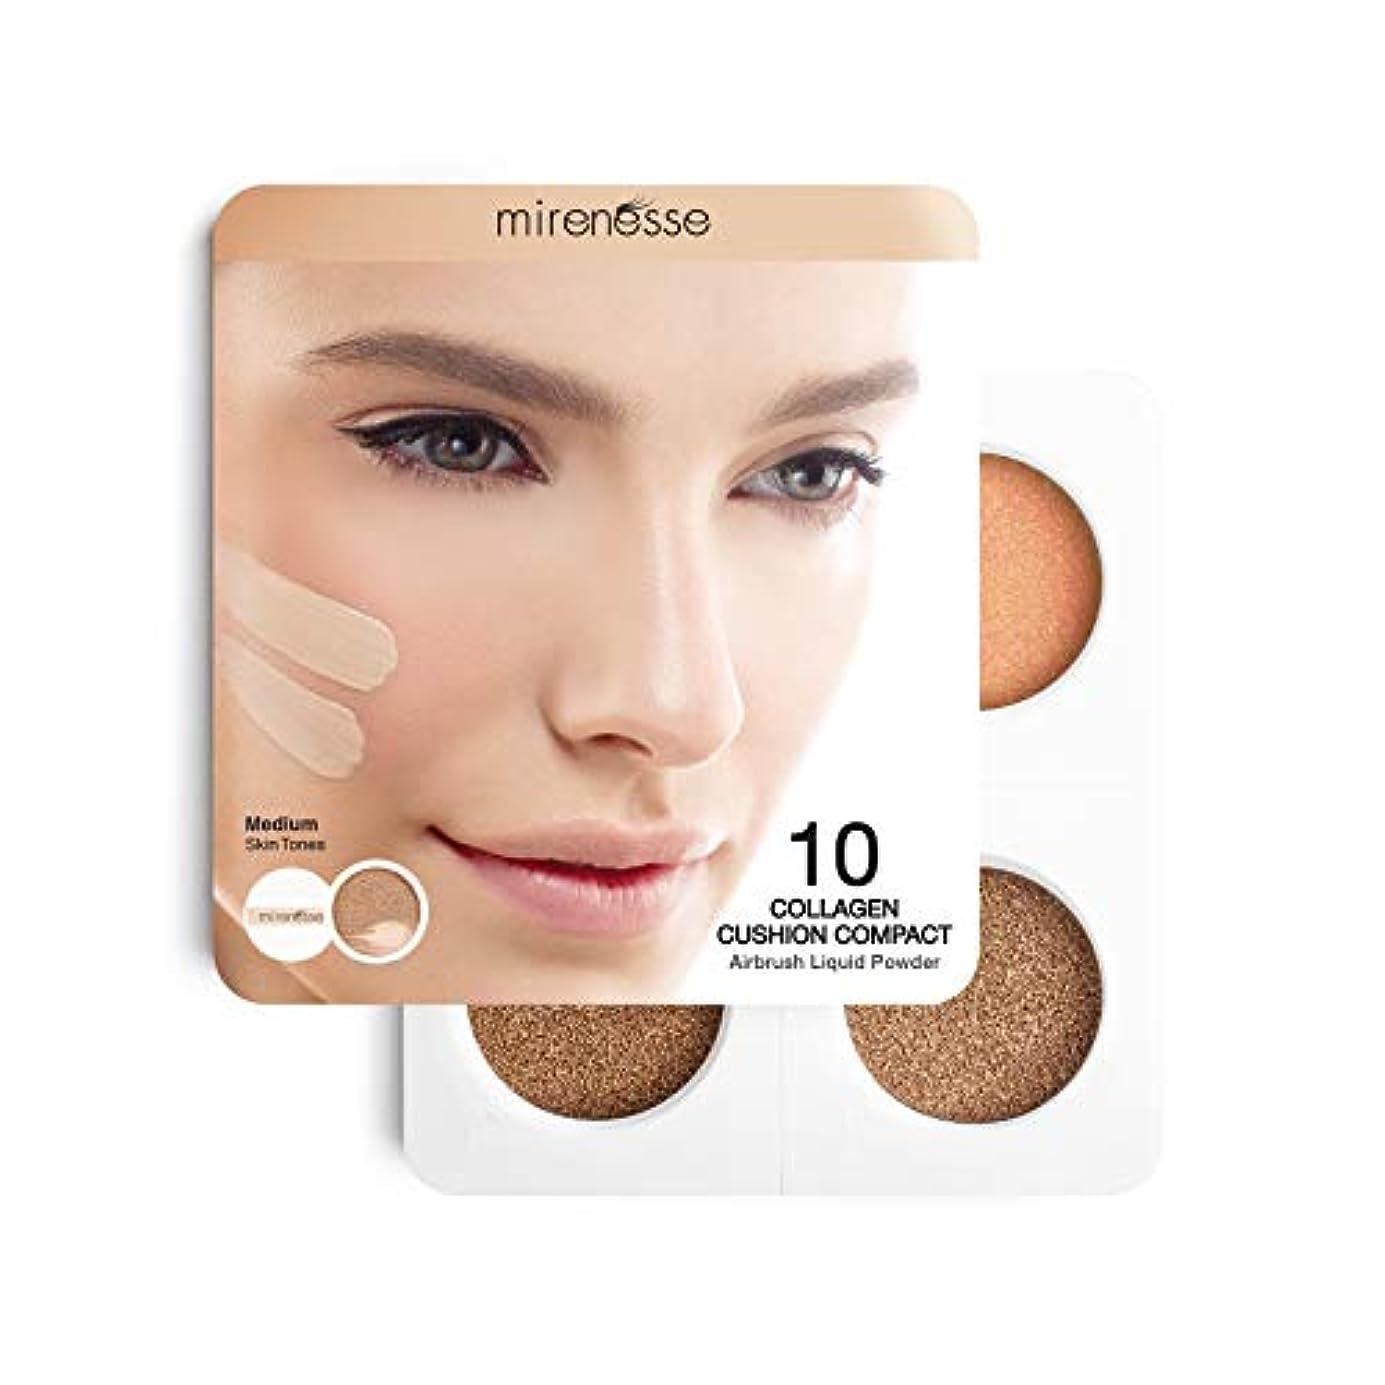 Mirenesse Cosmetics 4Pce 10 Collagen Cushion Foundation Sampler - Medium/Dark